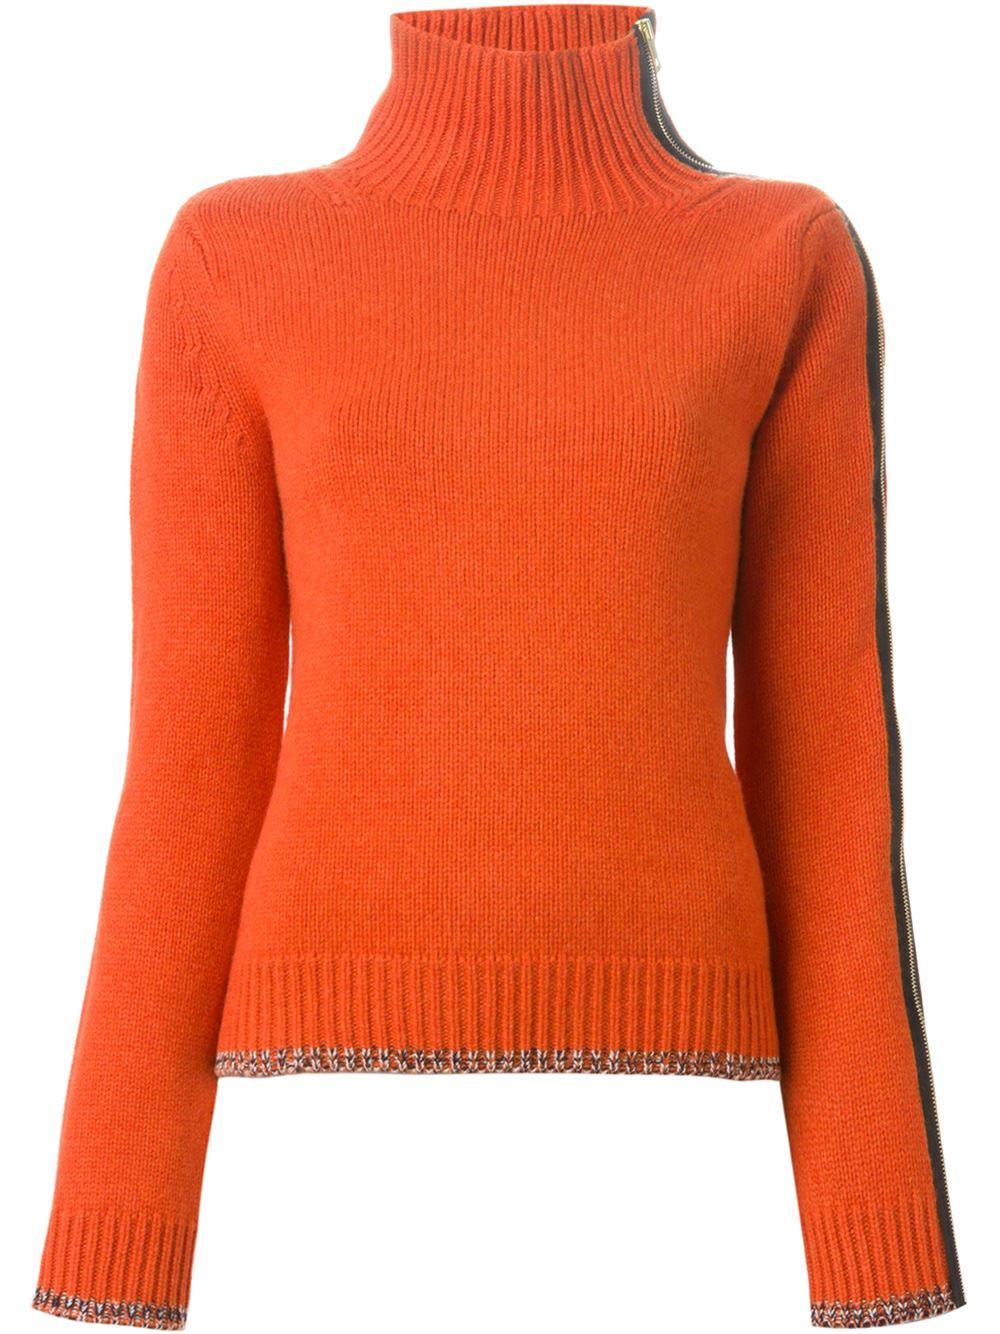 Orange cashmere-wool blend Sarah sweater from Rag and Bone